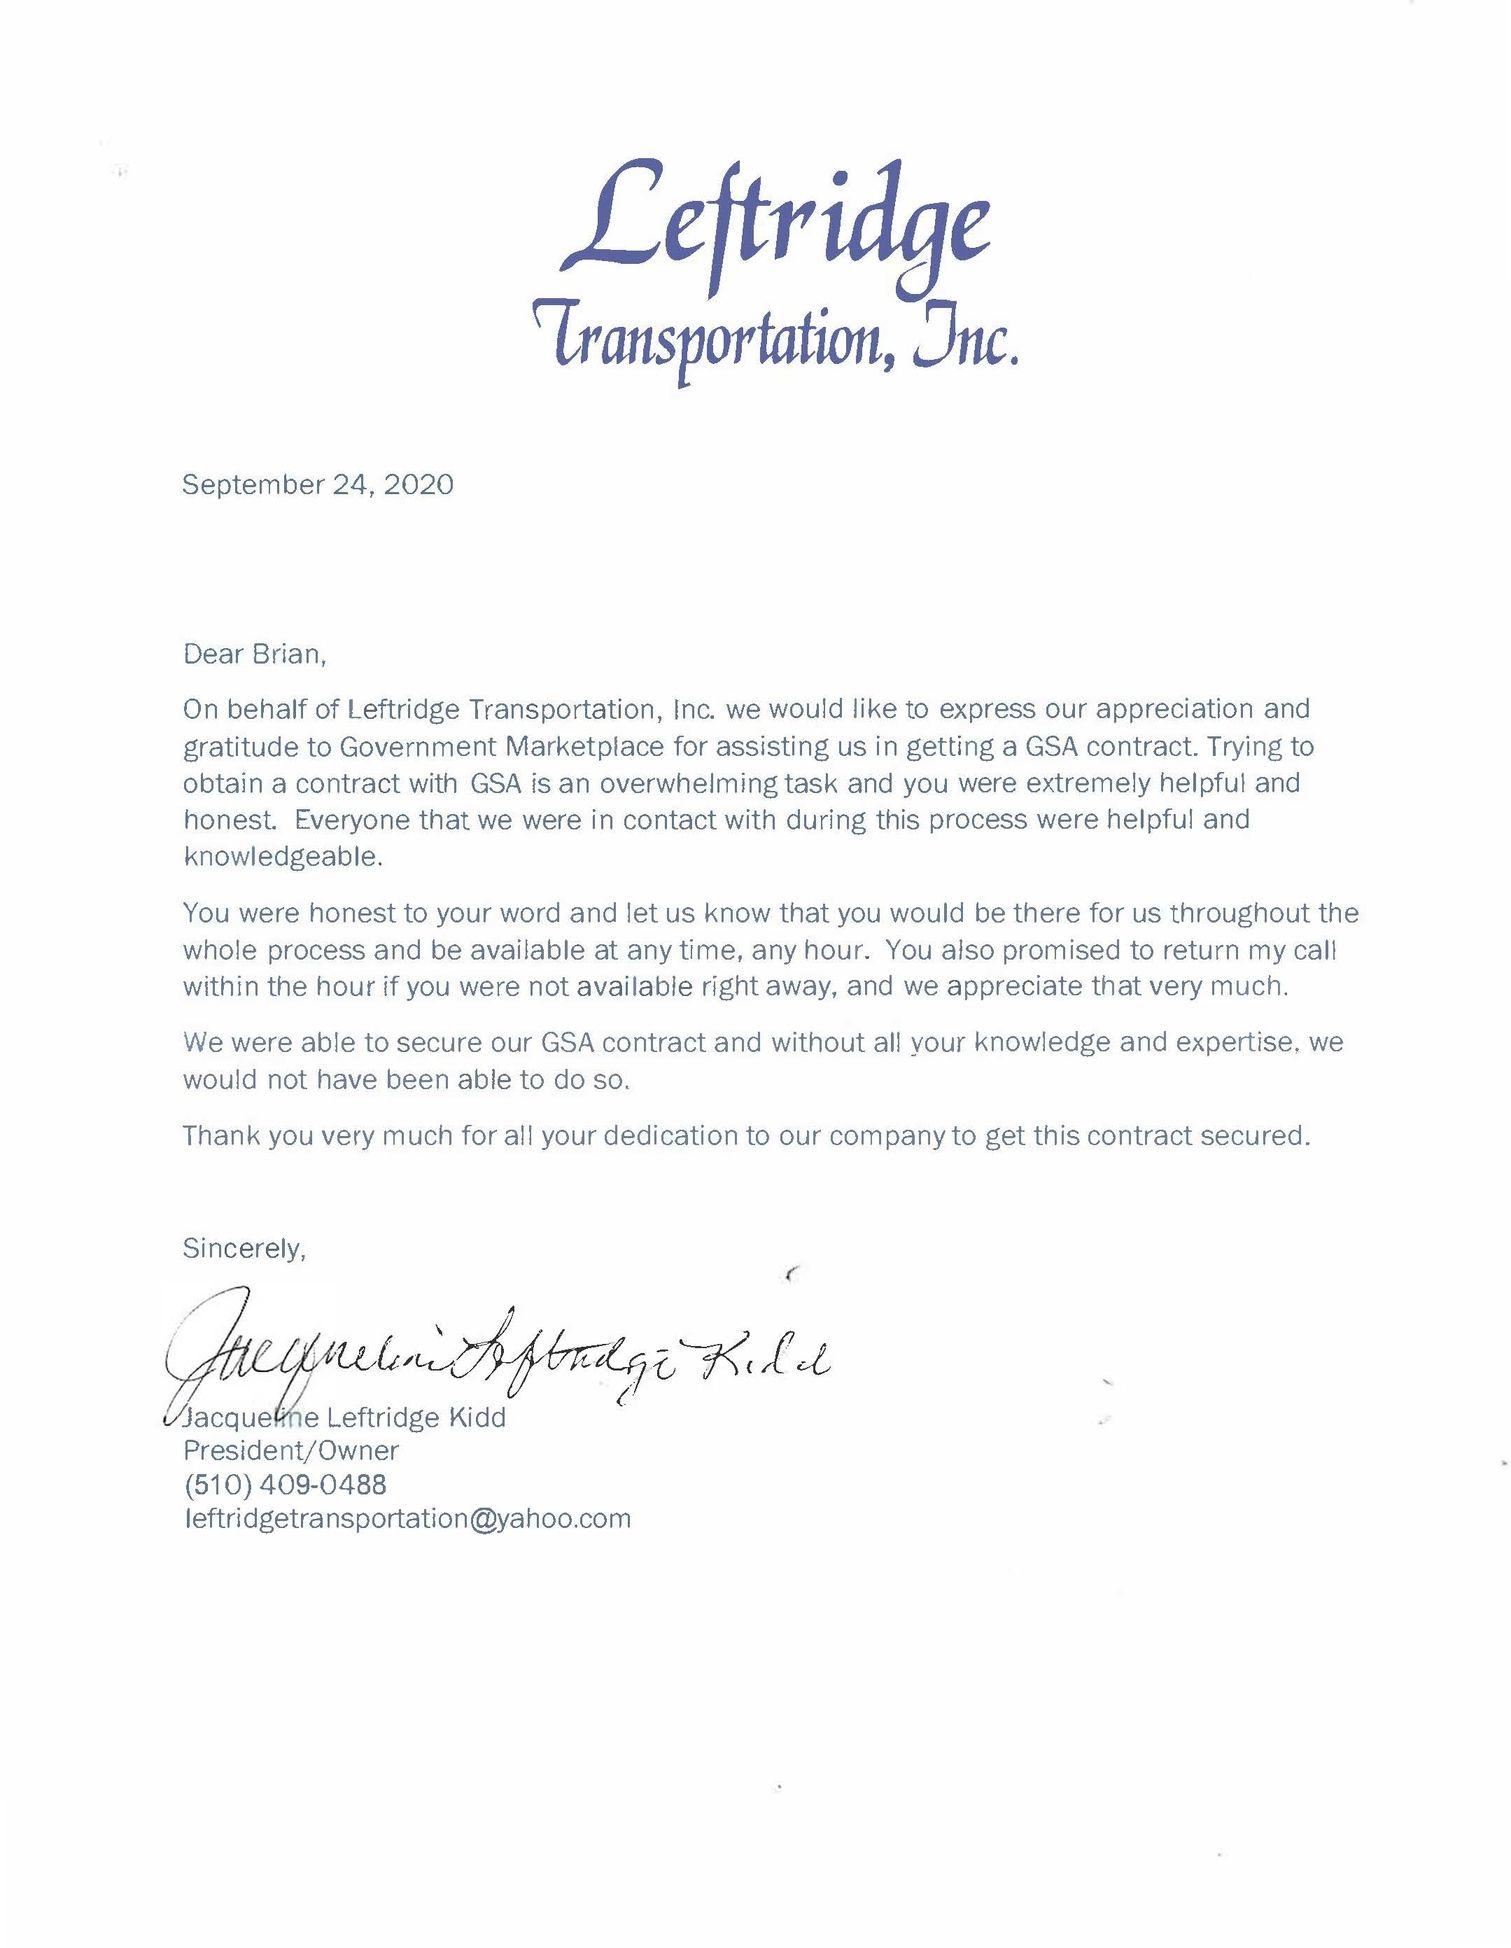 Leftridge Transportation, Inc.